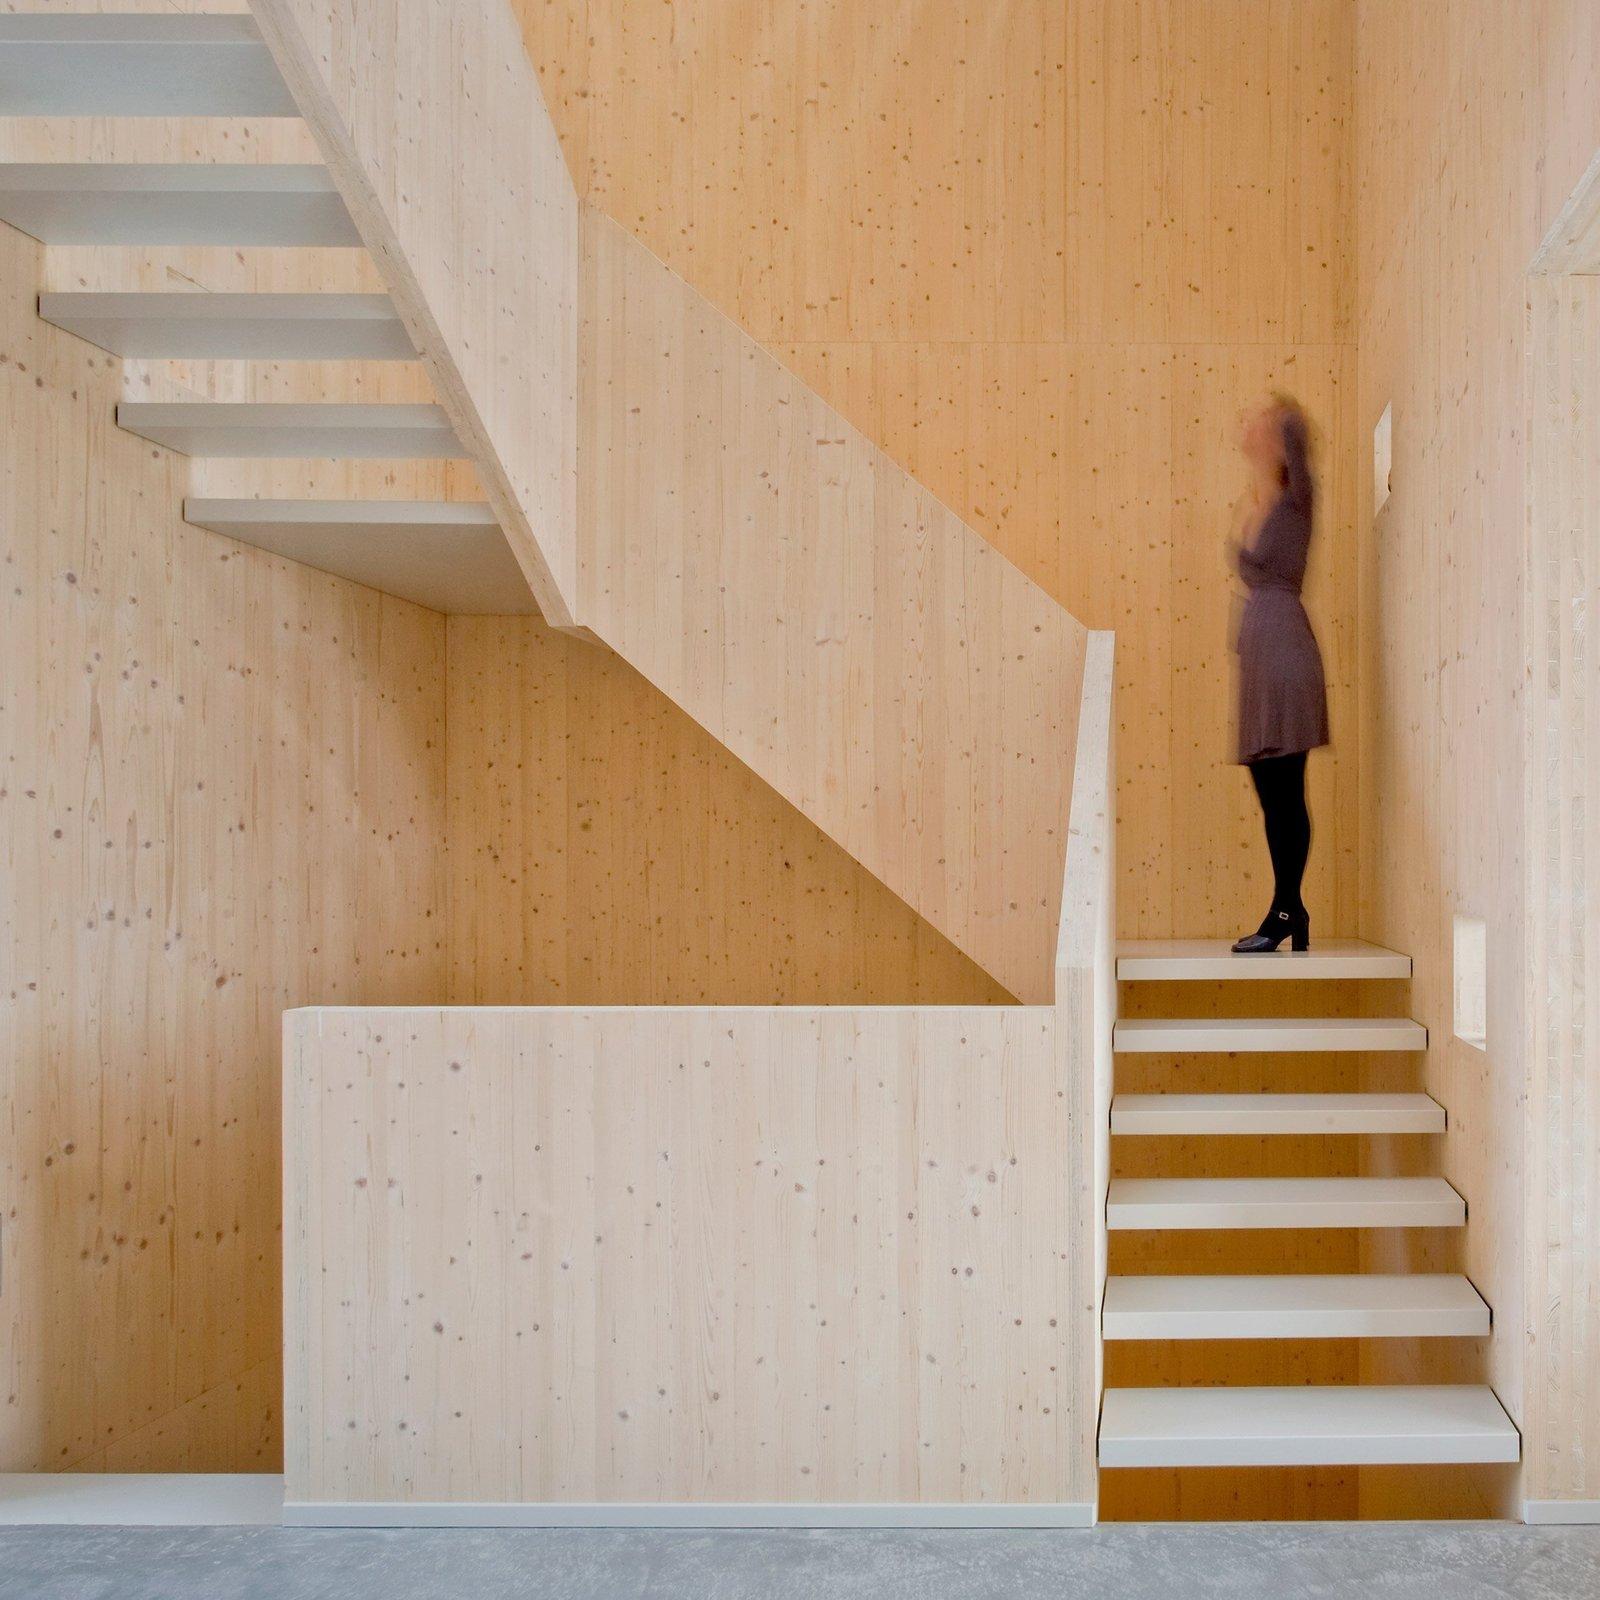 Via Dezeen, photo by Marcel van der Burg  Photo 6 of 11 in This Week's 10 Best Houses